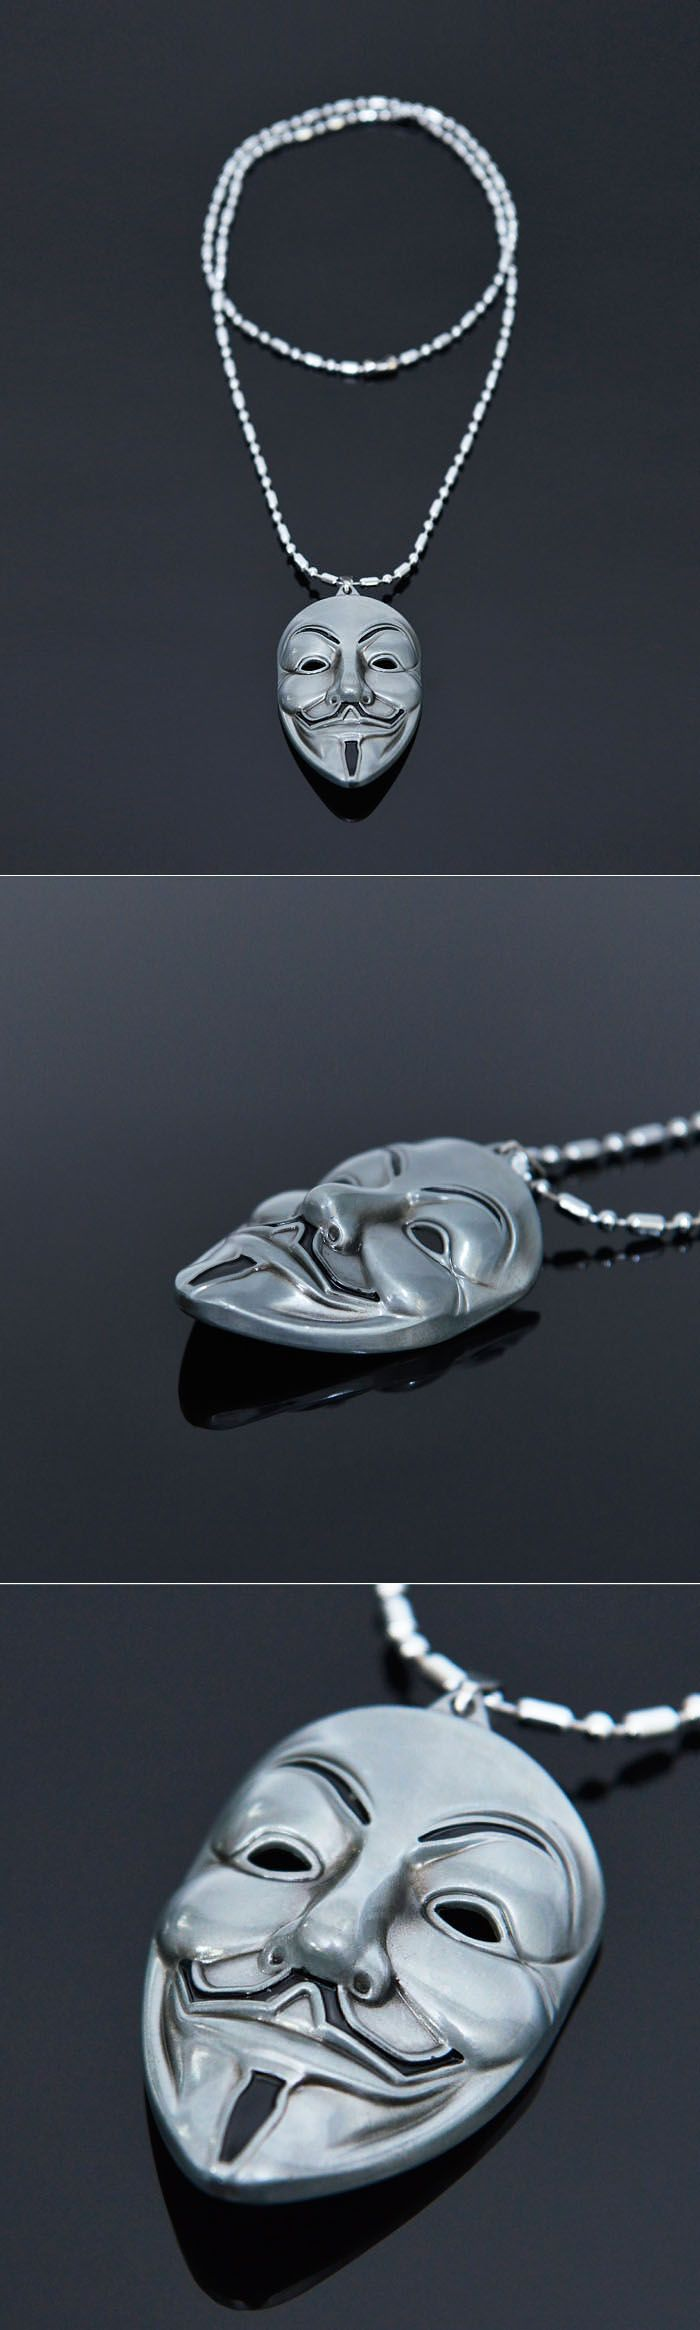 Accessories :: V For Vendetta Mask Pendant Long-Necklace 303 - GUYLOOK Men's Trendy Fashion Clothing Online